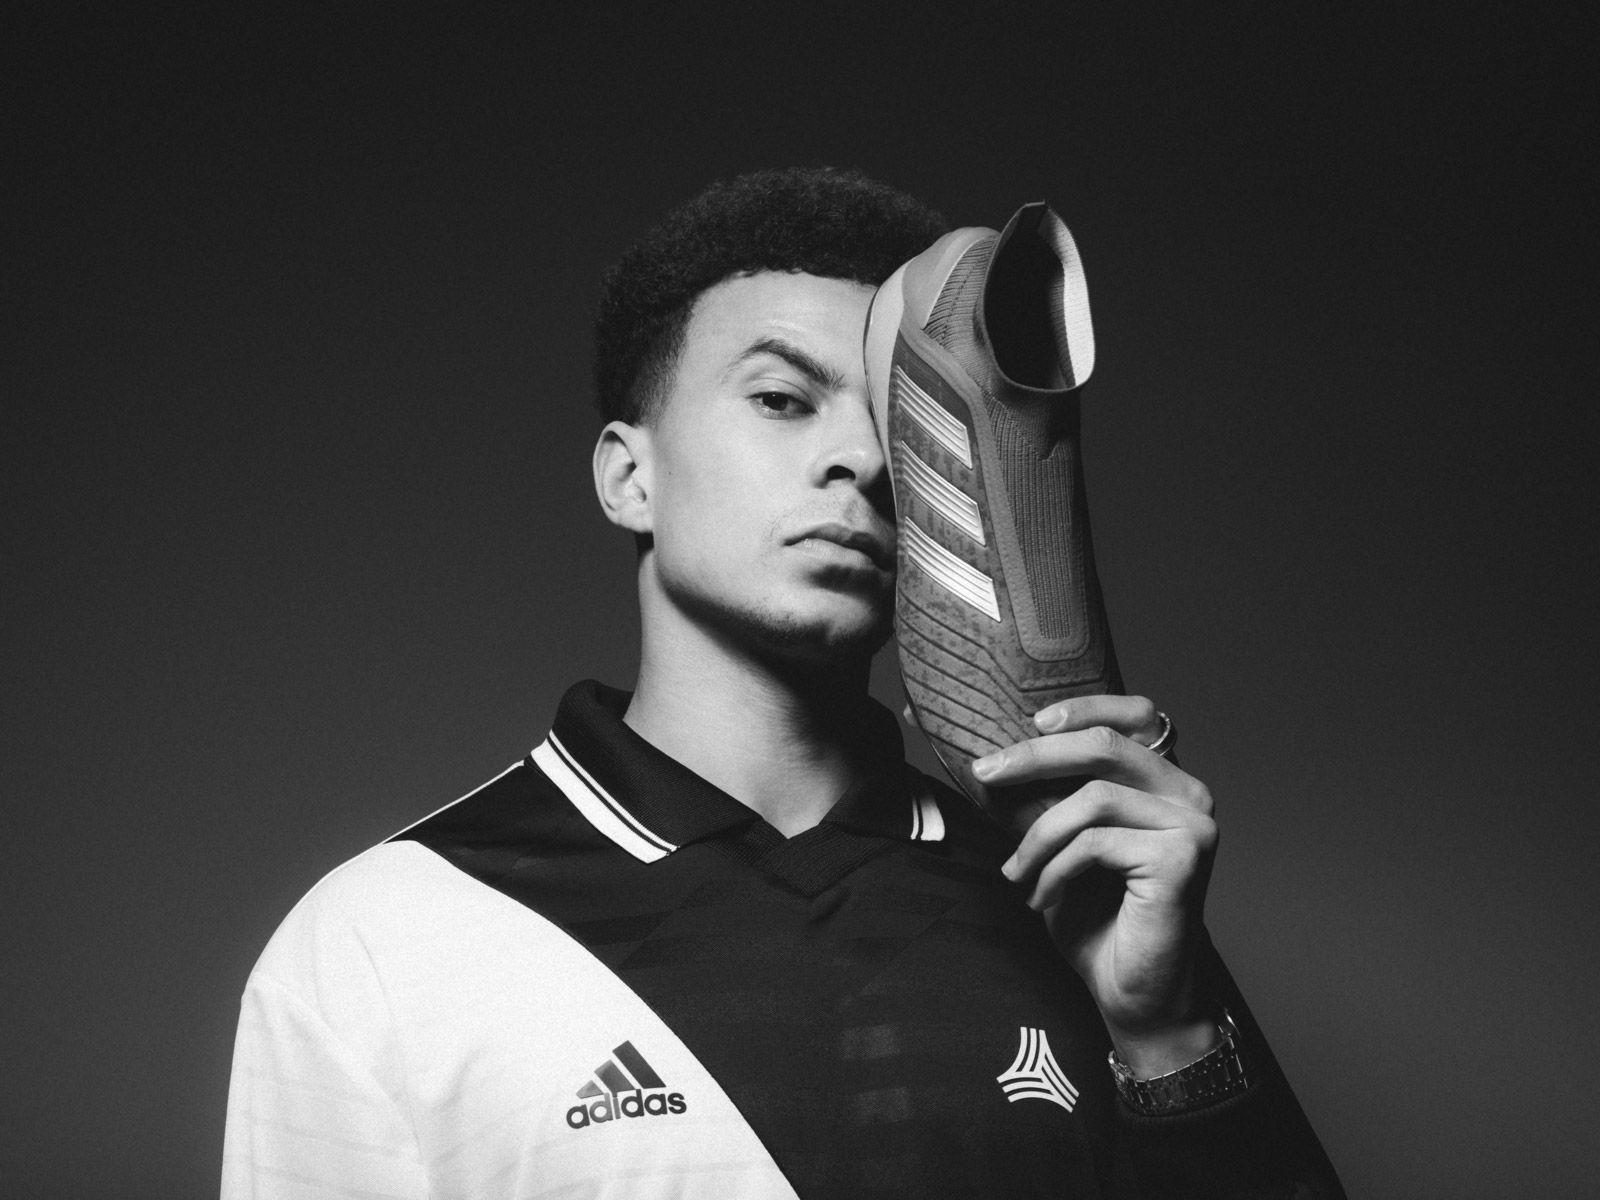 adidas fit goals dele alli main adidas football fitgoals